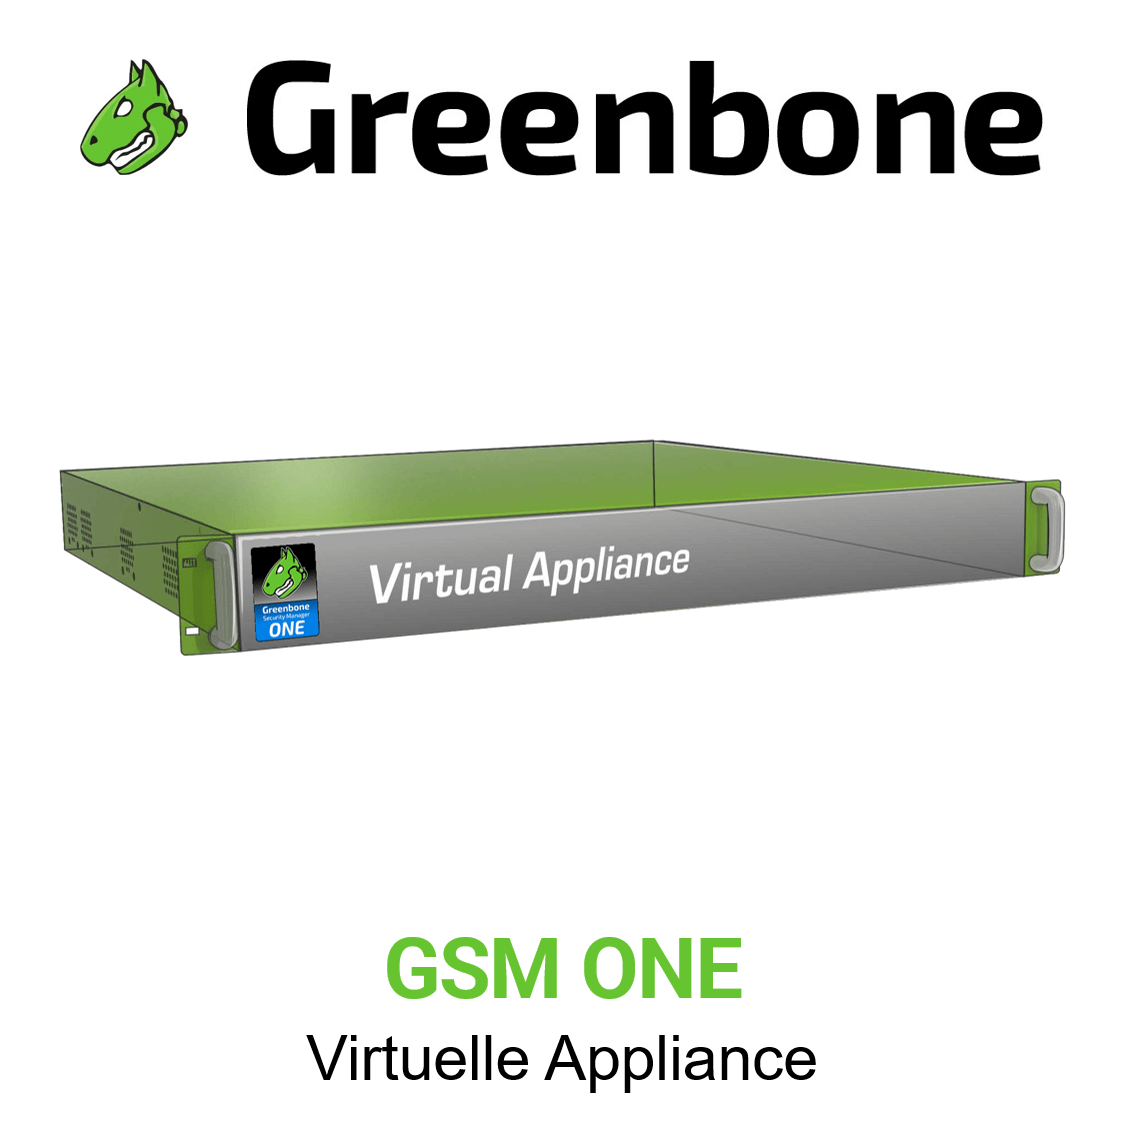 Greenbone GSM ONE Virtuelle Appliance